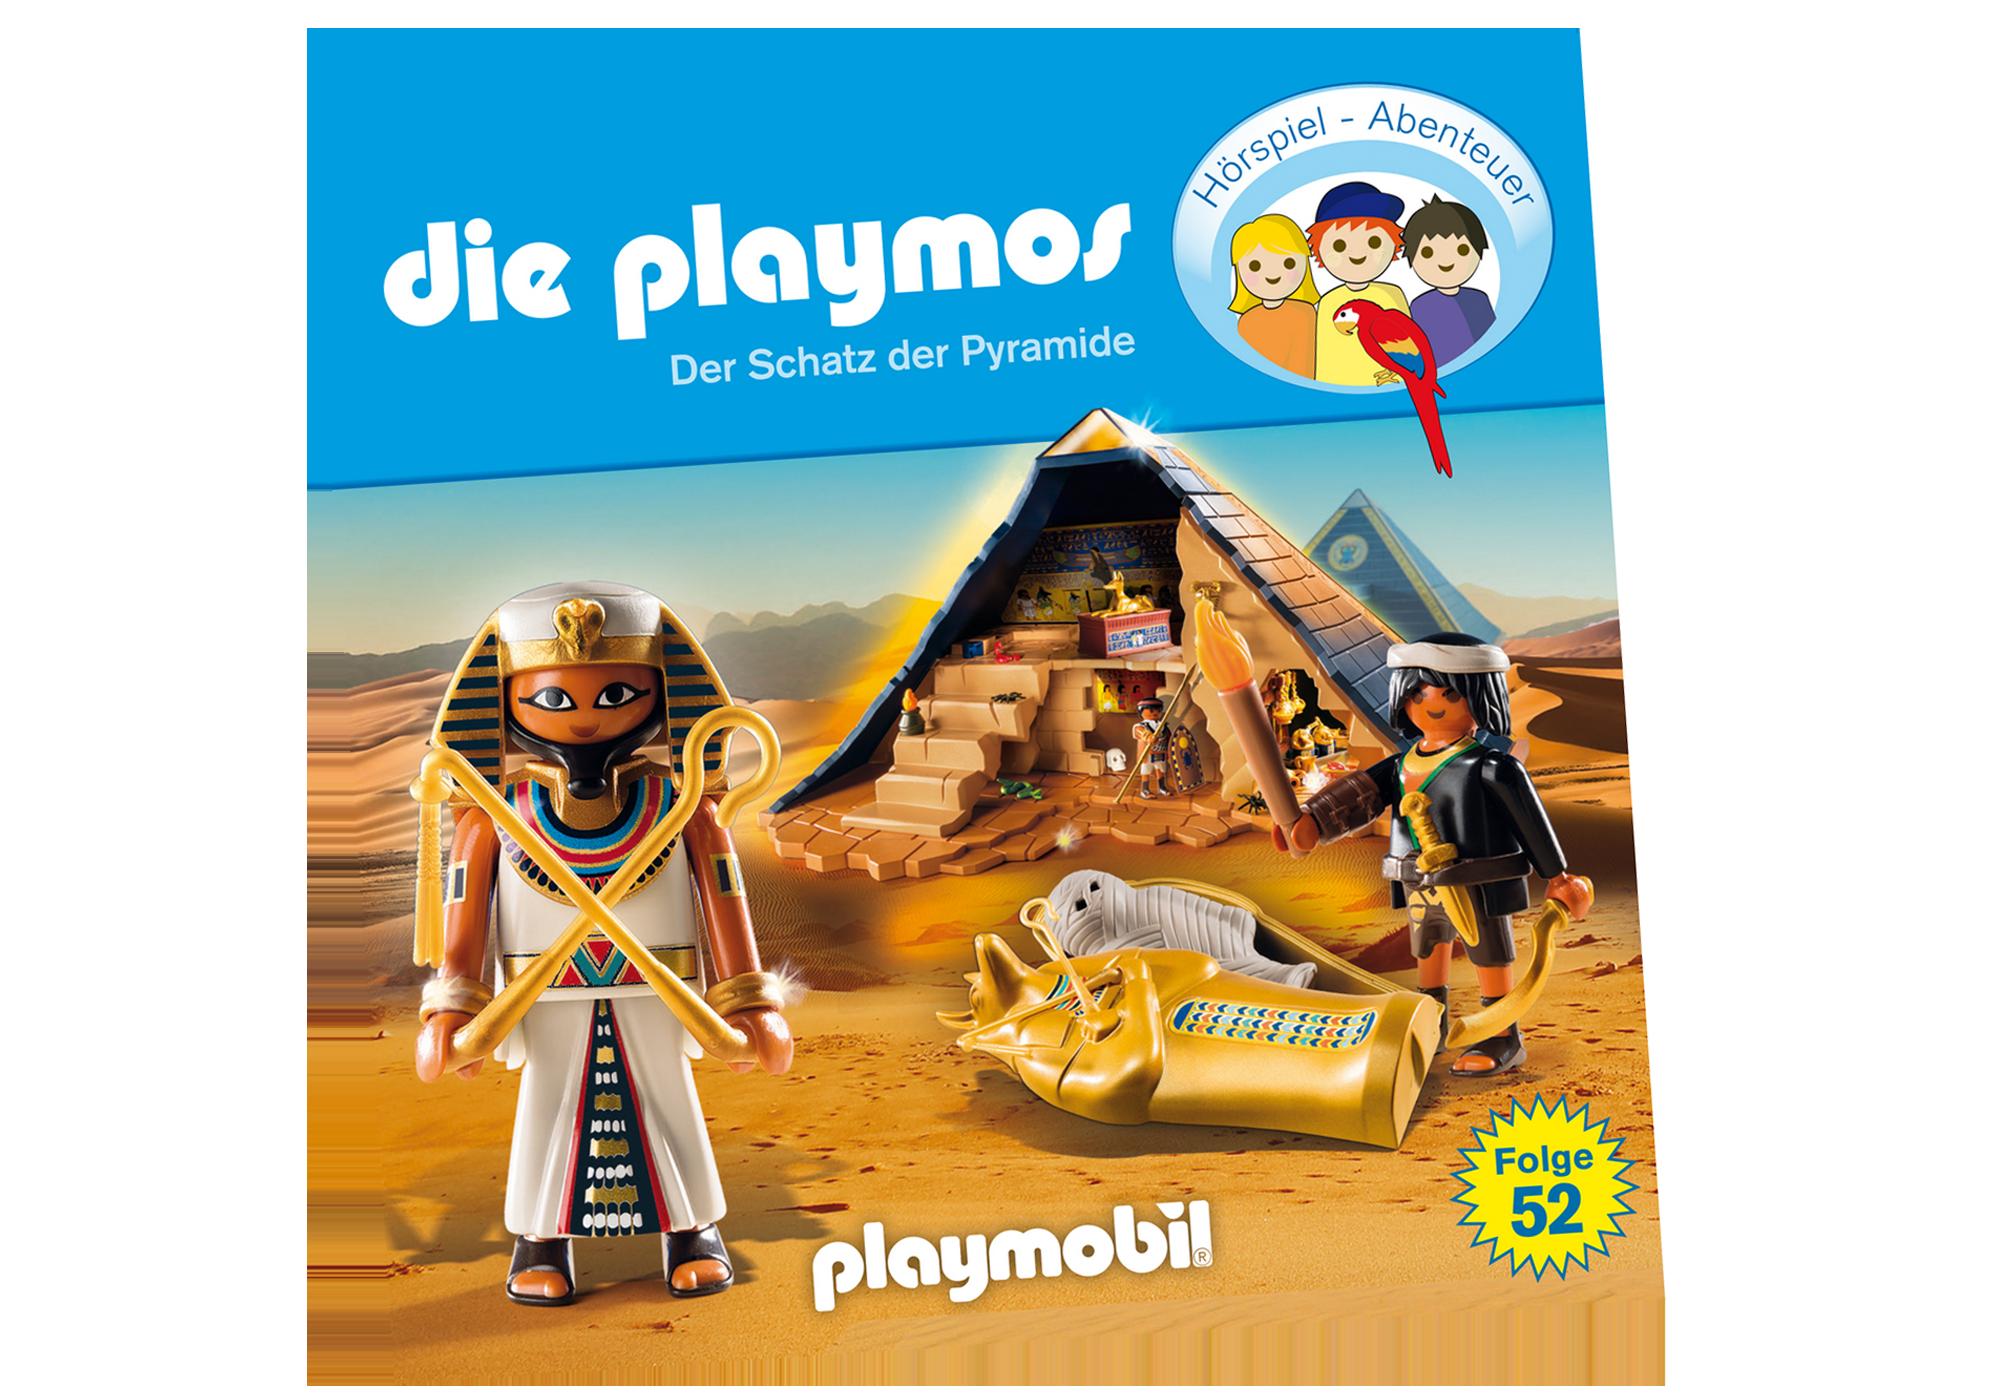 http://media.playmobil.com/i/playmobil/80259_product_detail/Der Schatz der Pyramide - Folge 52